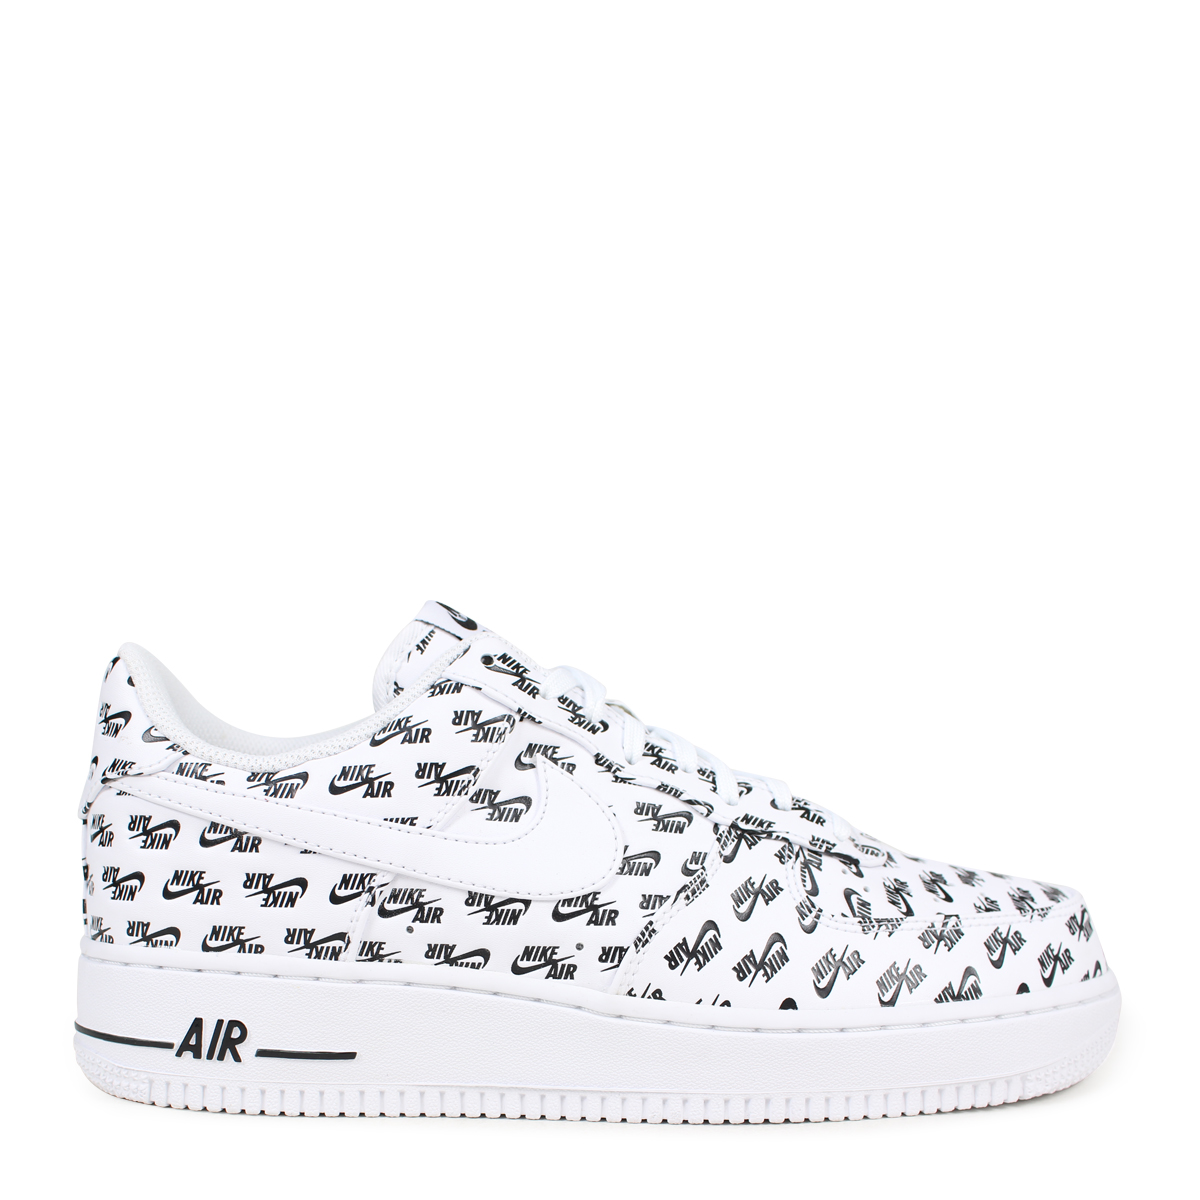 Nike NIKE air force 1 07 sneakers men AIR FORCE 1 QS ALL OVER LOGO AH8462 100 white white [193]